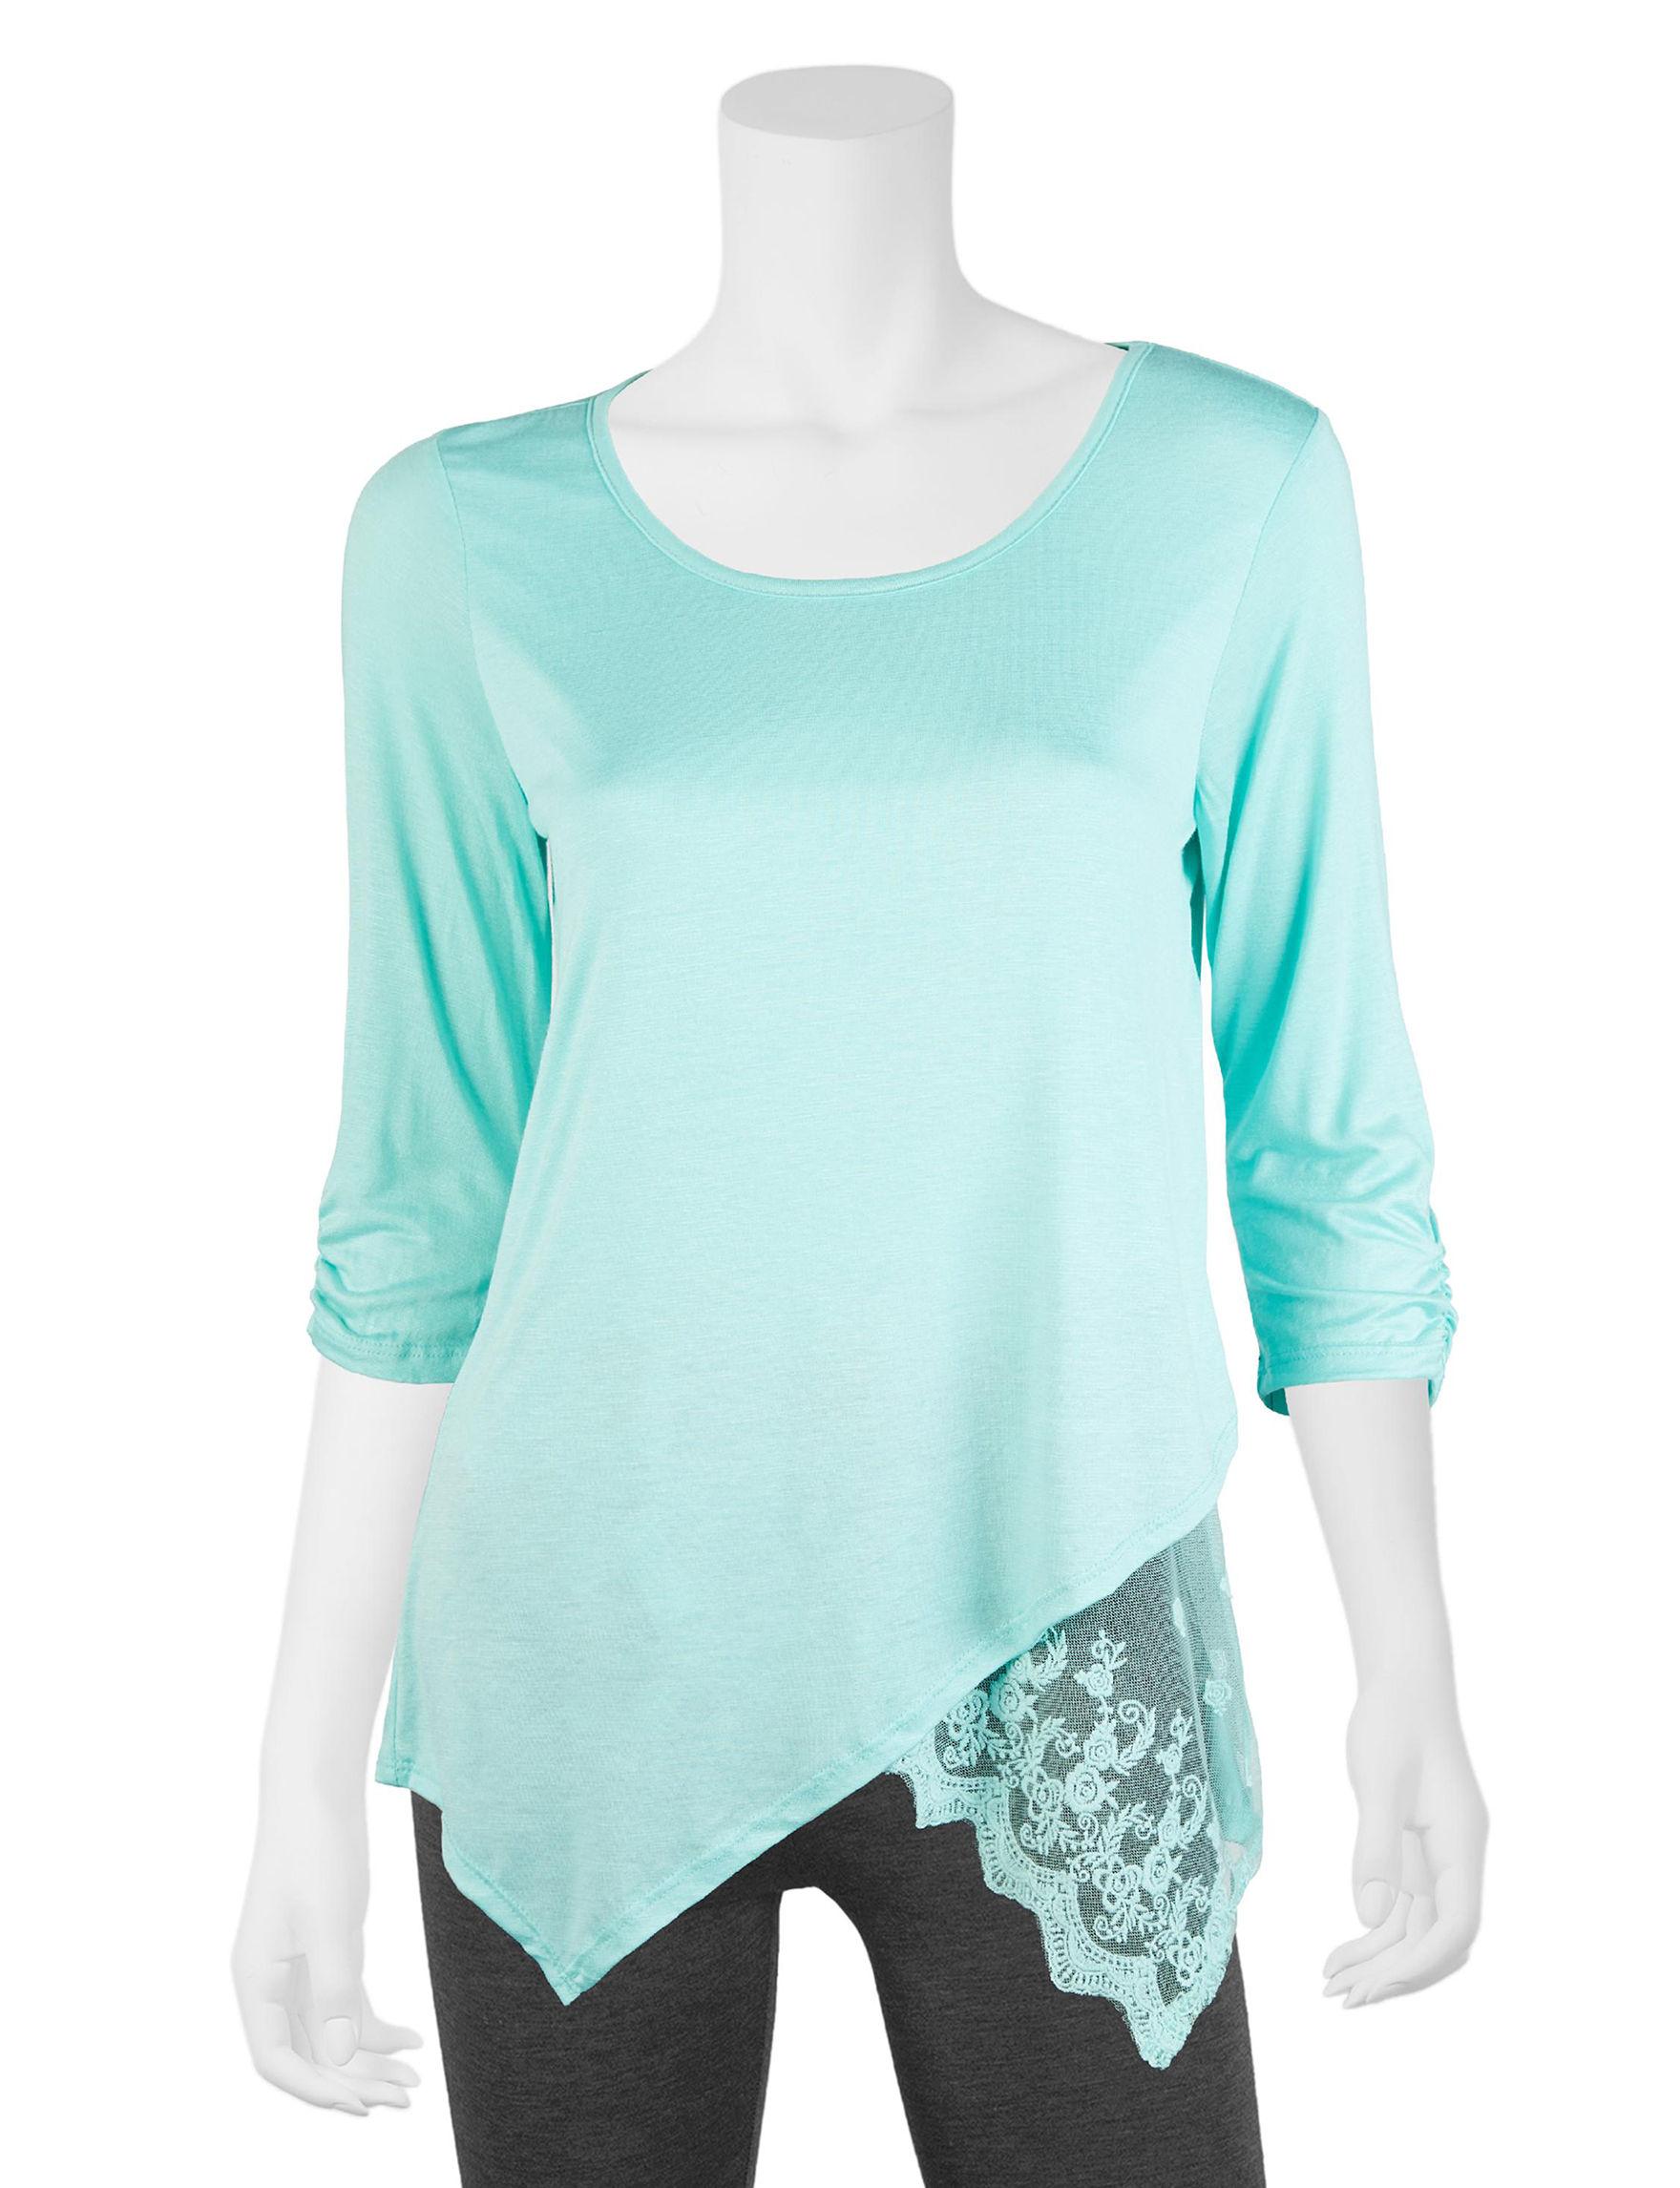 A. Byer Mint Shirts & Blouses